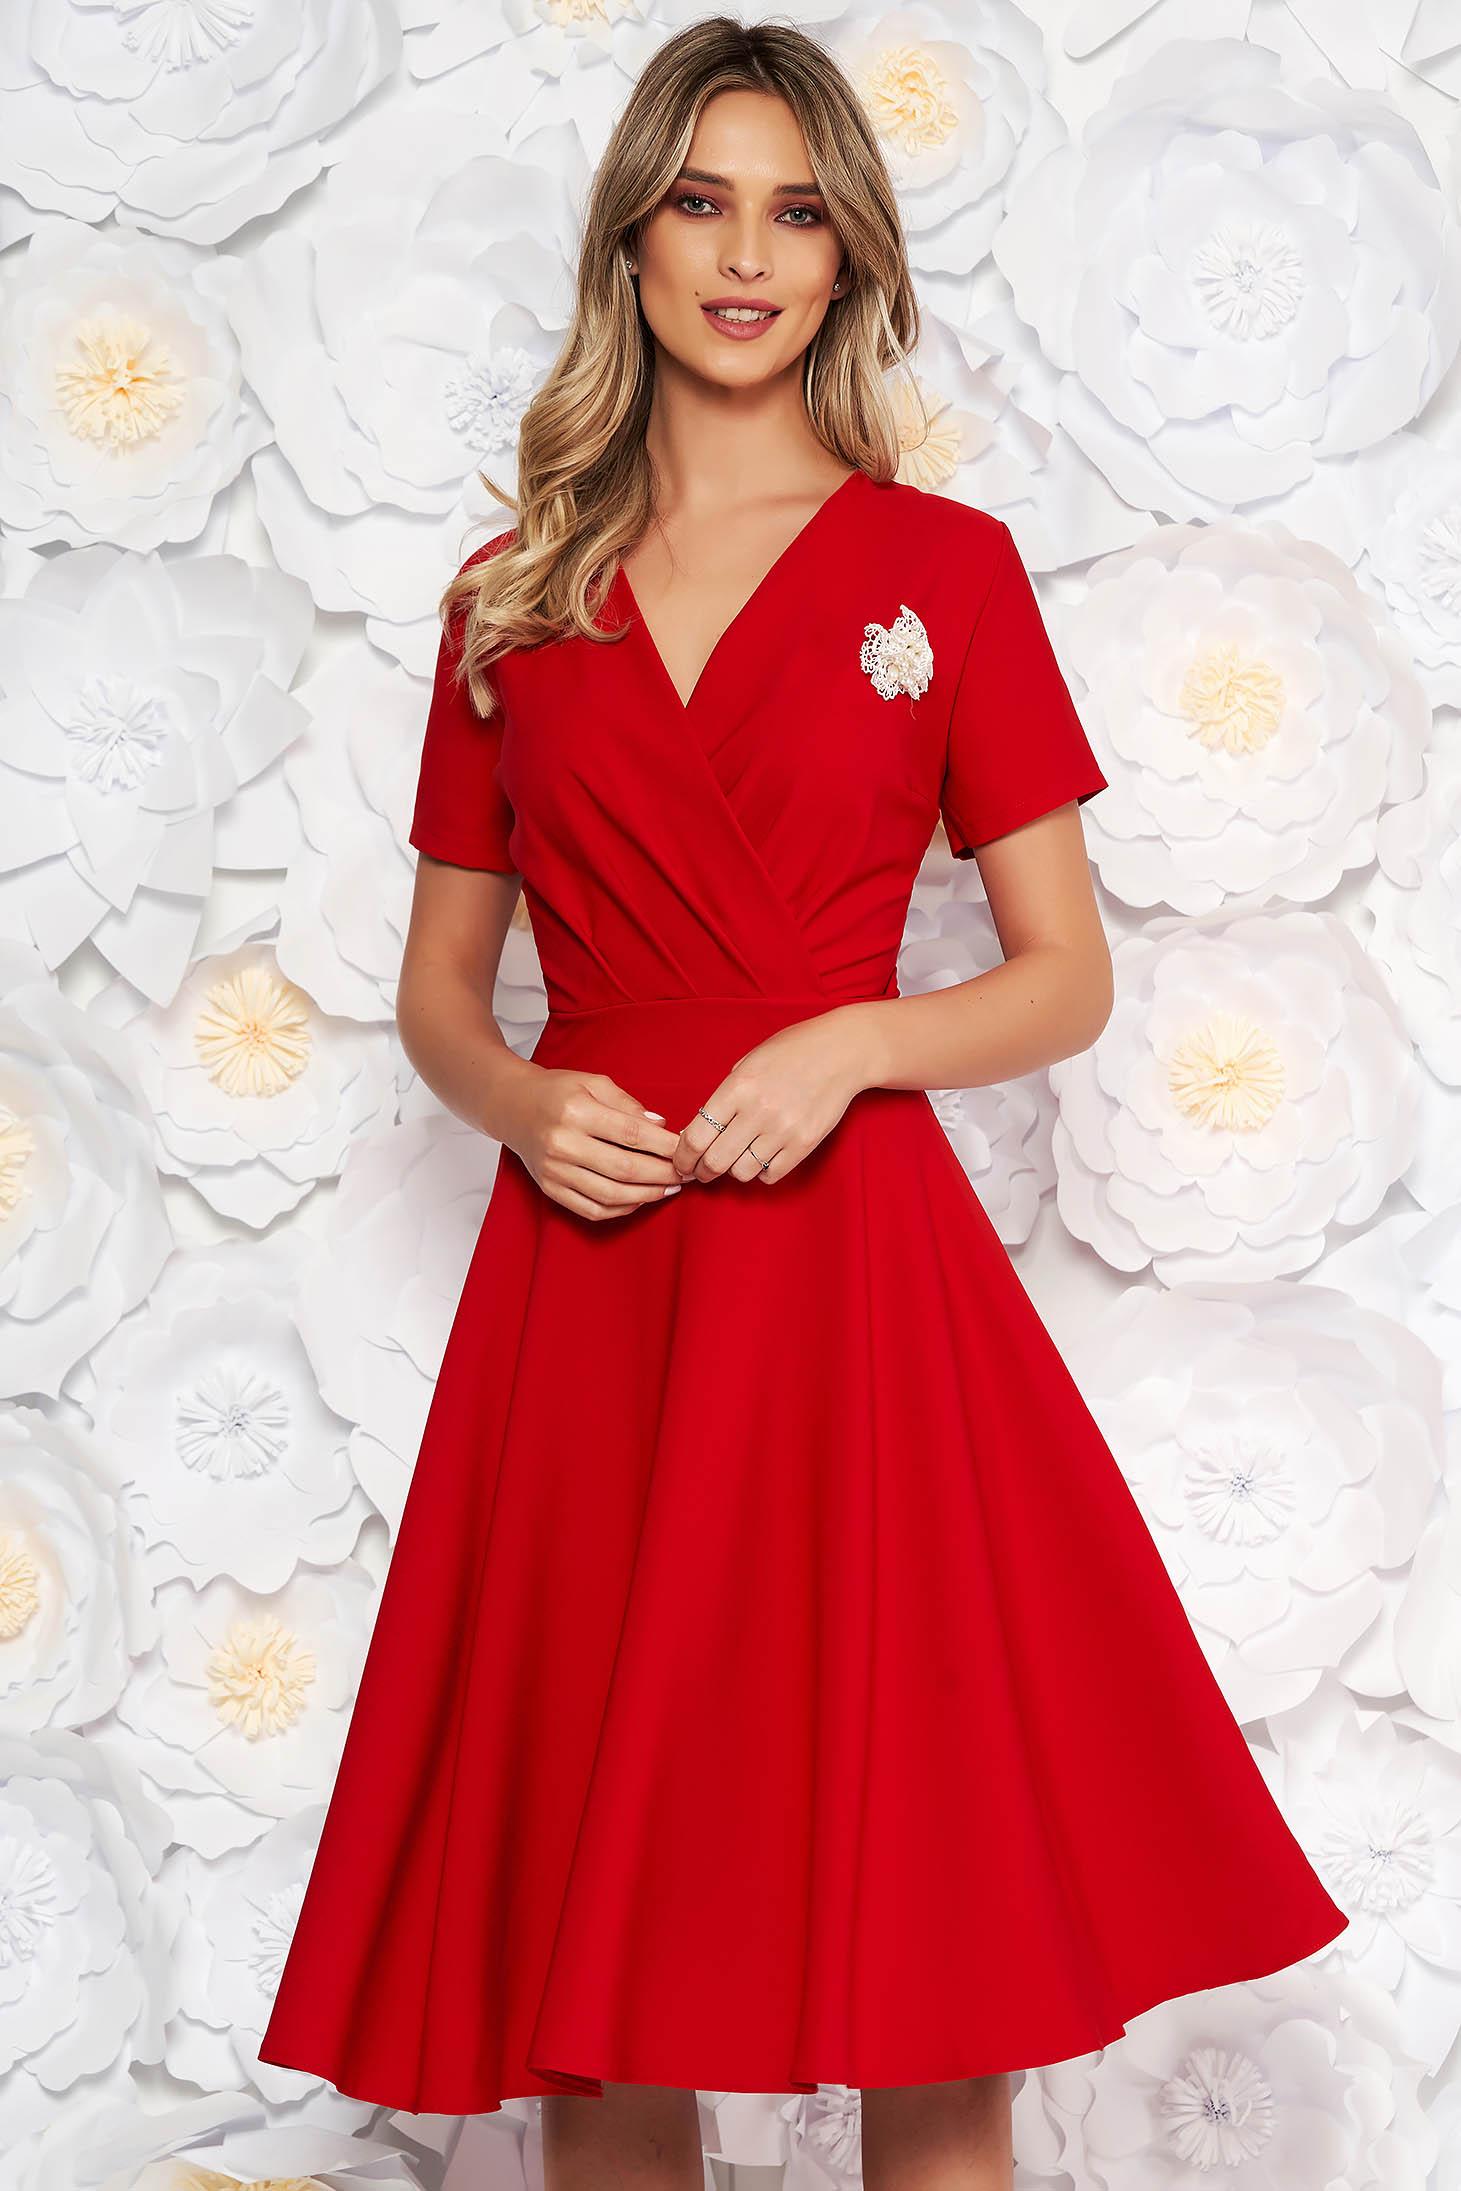 Rochie rosie eleganta in clos din stofa elastica subtire accesorizata cu brosa